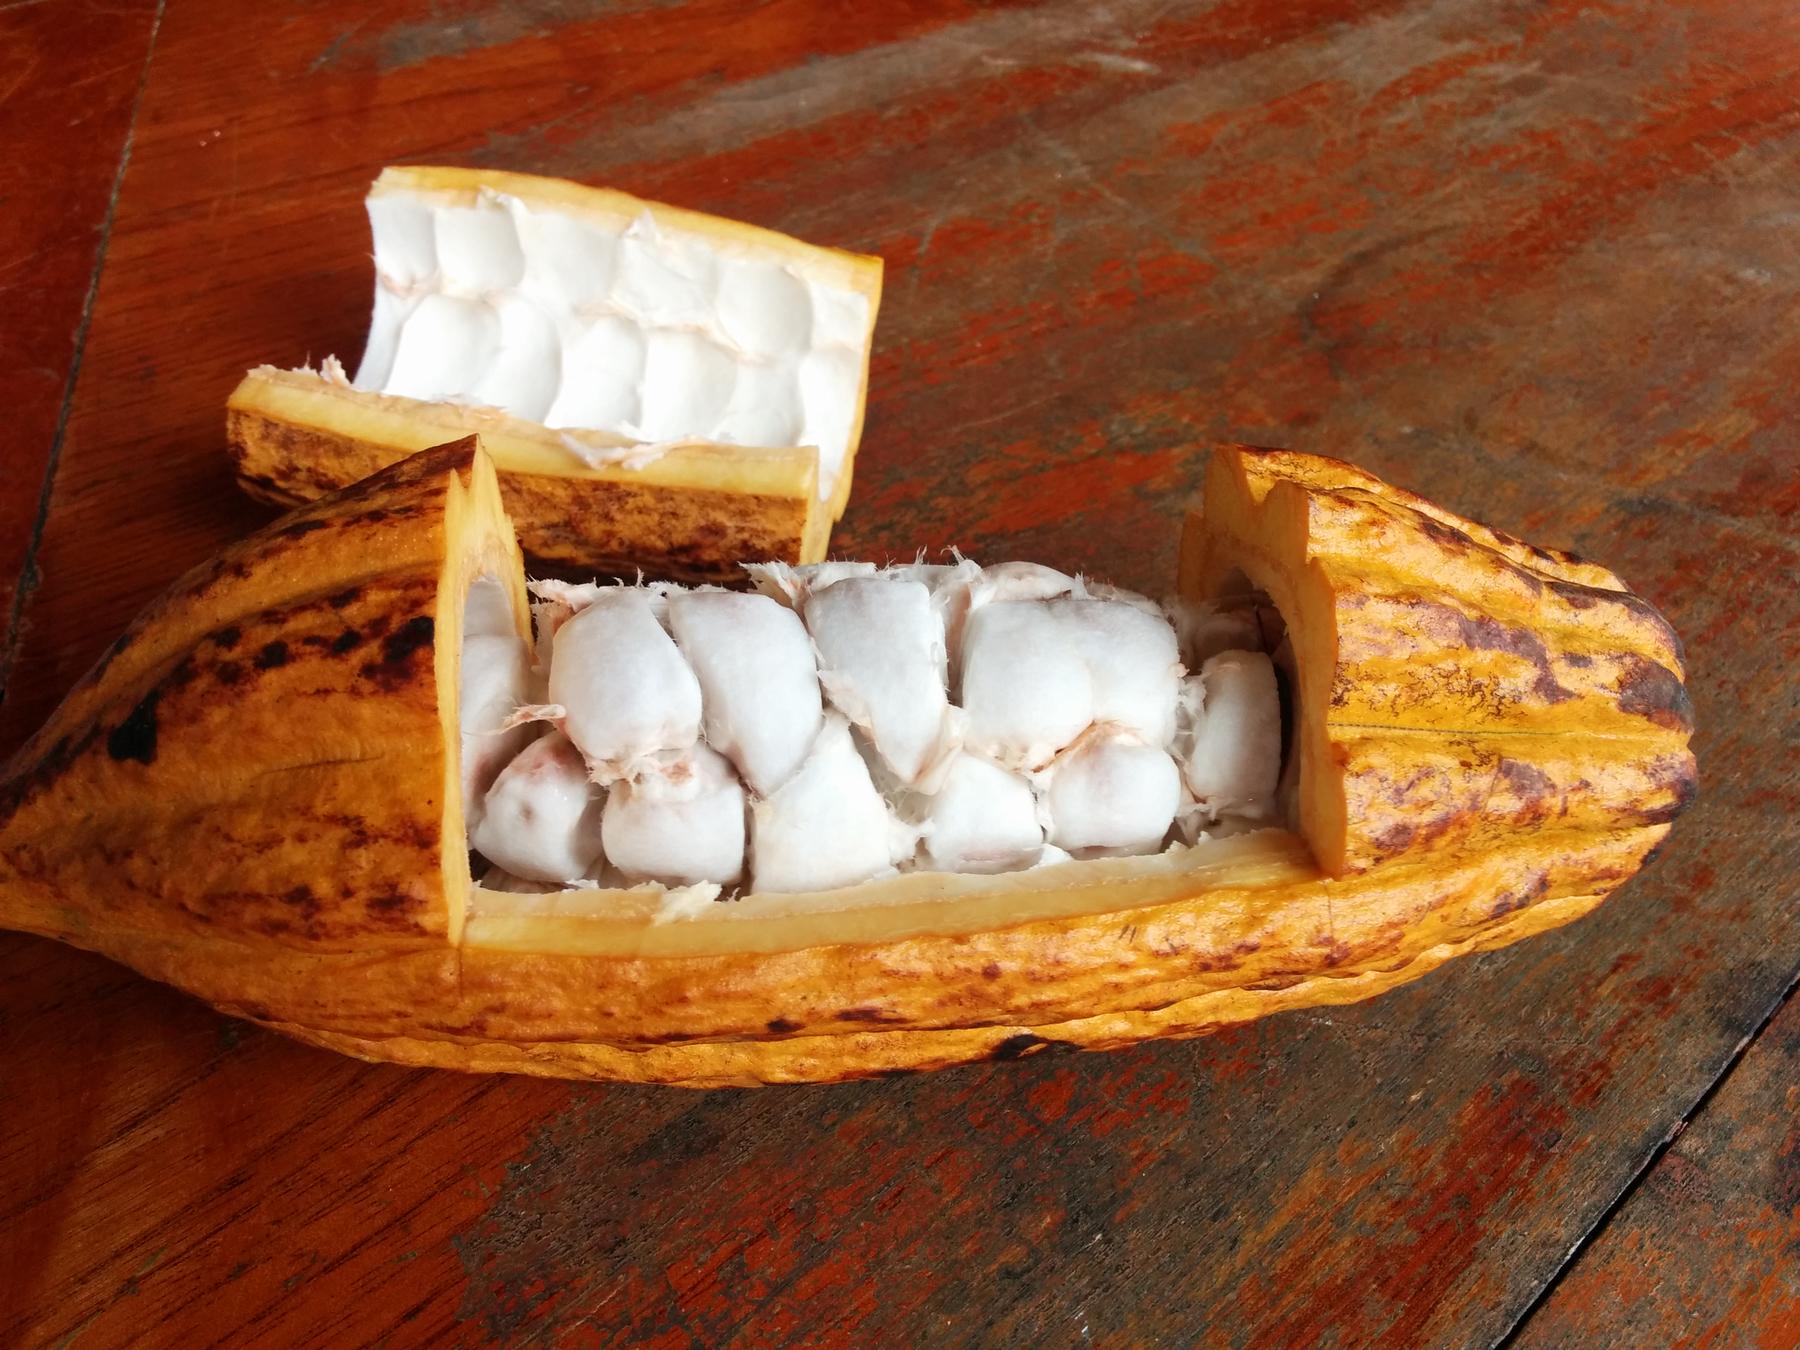 Cut open cacao pod